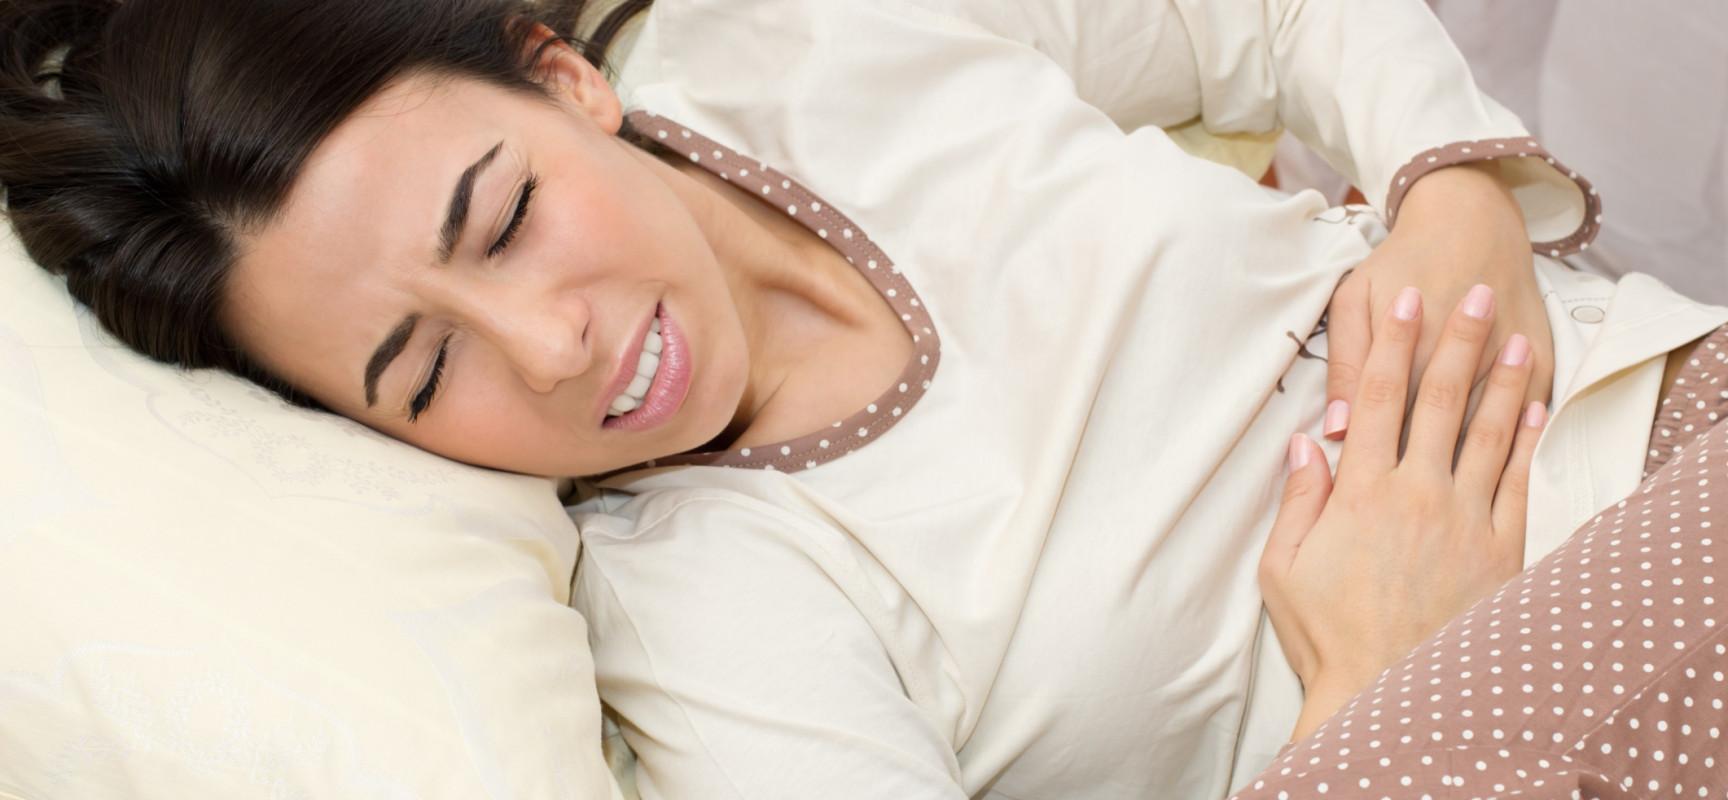 Синдром раздраженного кишечника (СРК)